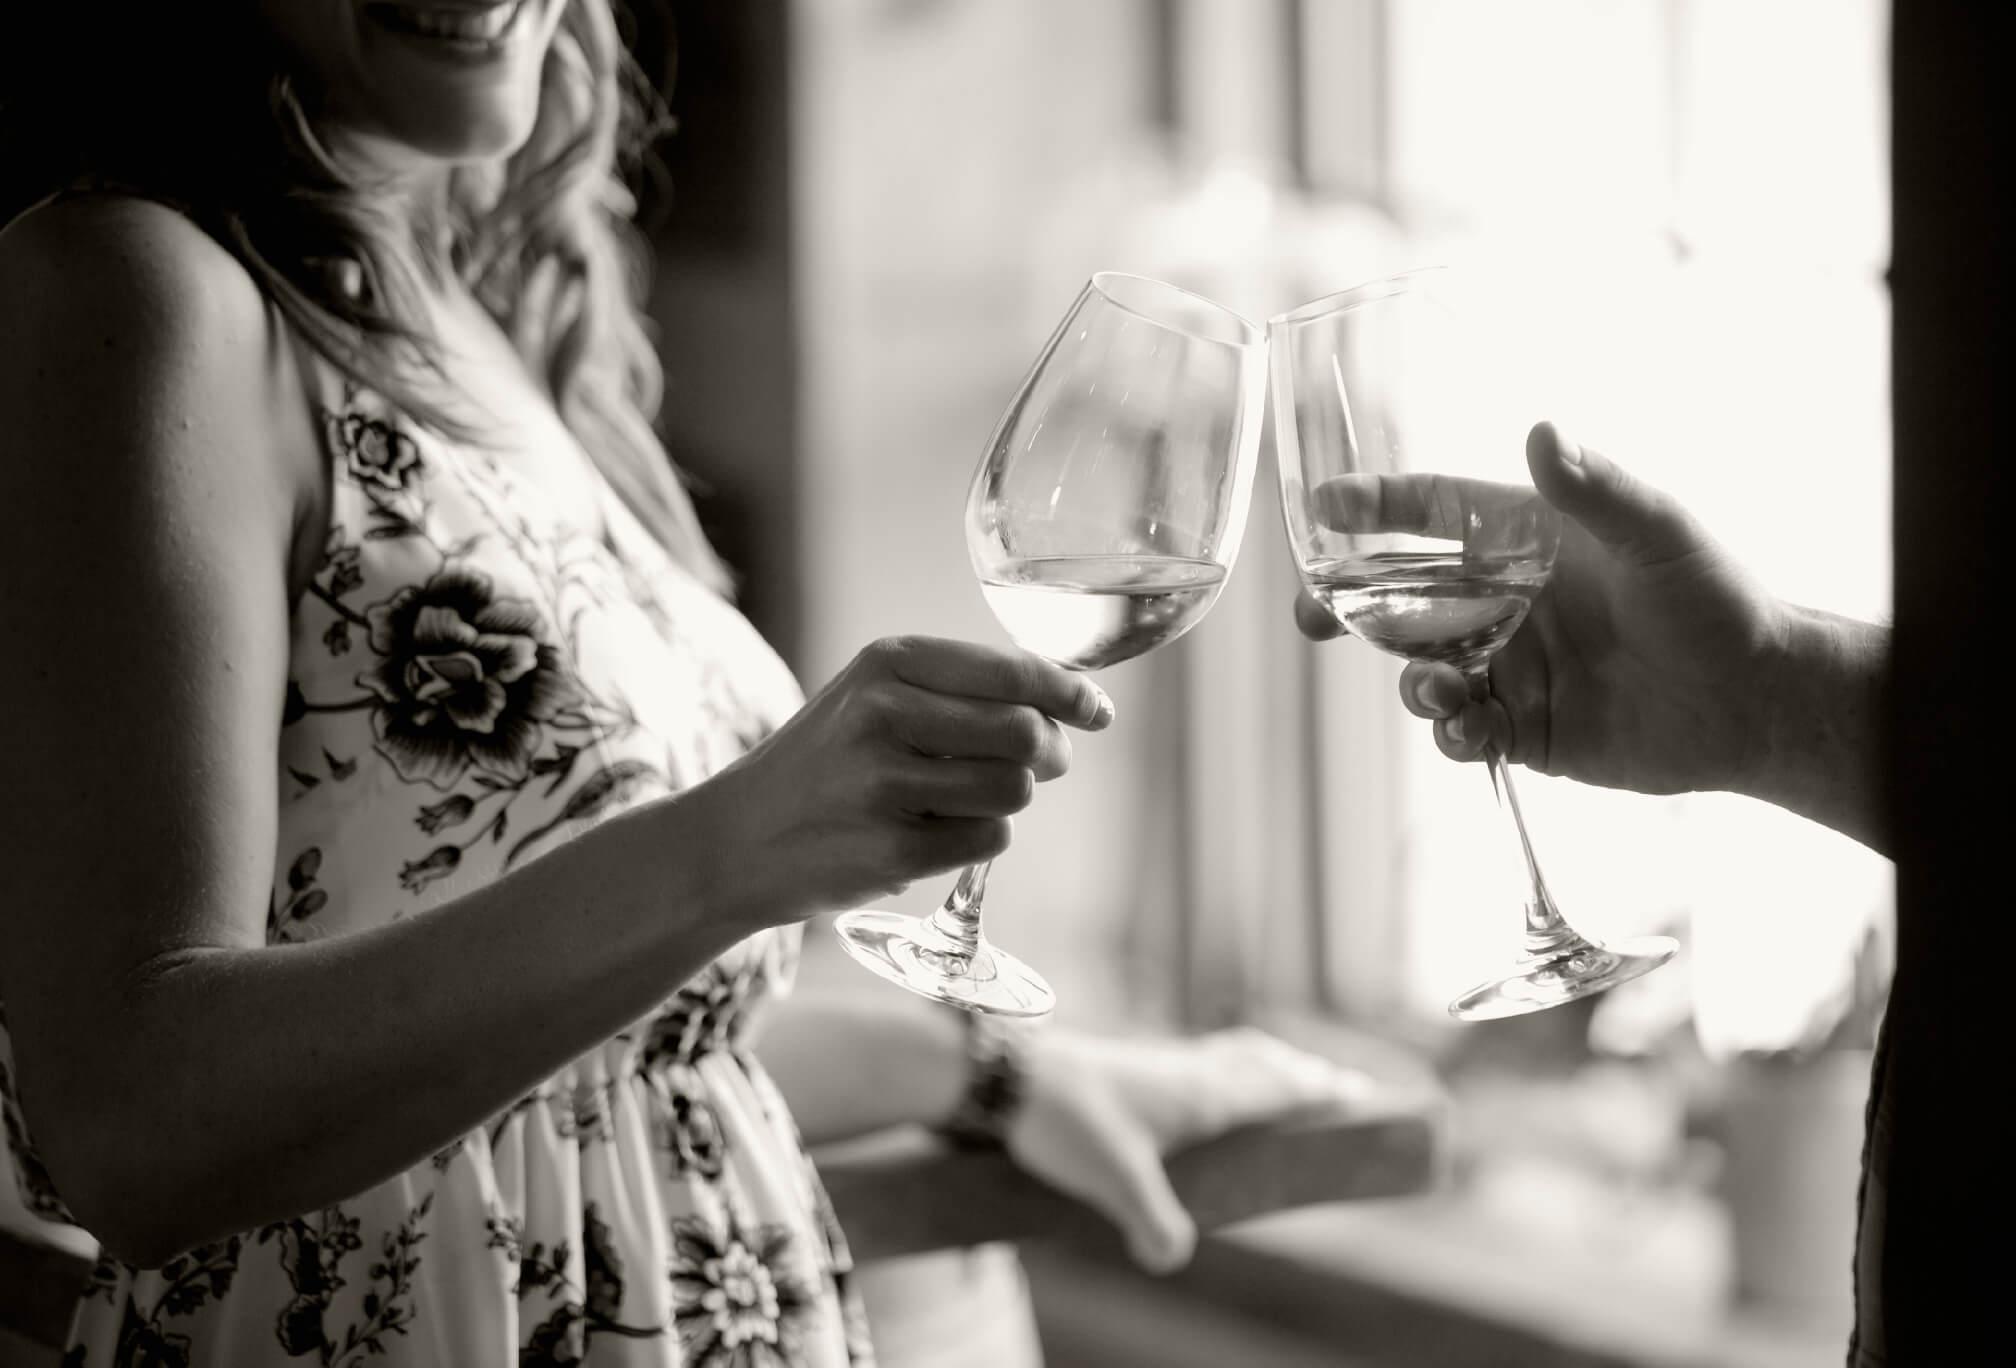 niagara vineland engagement candid